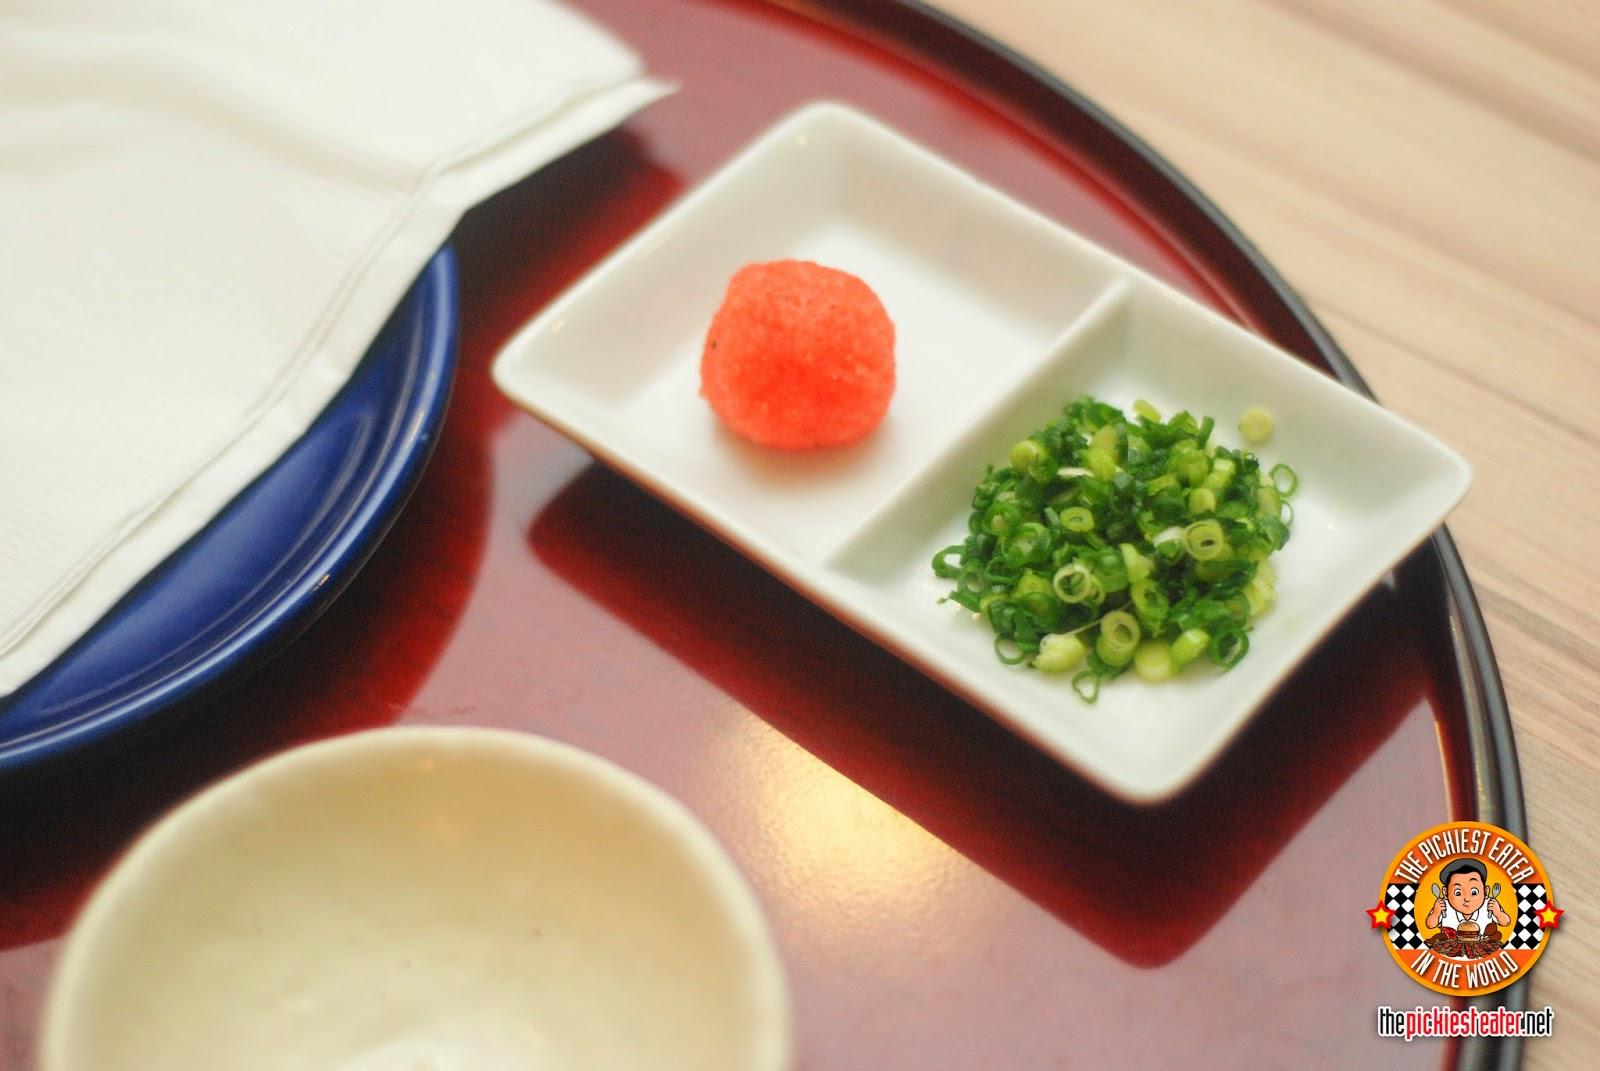 sauce radish and green onions